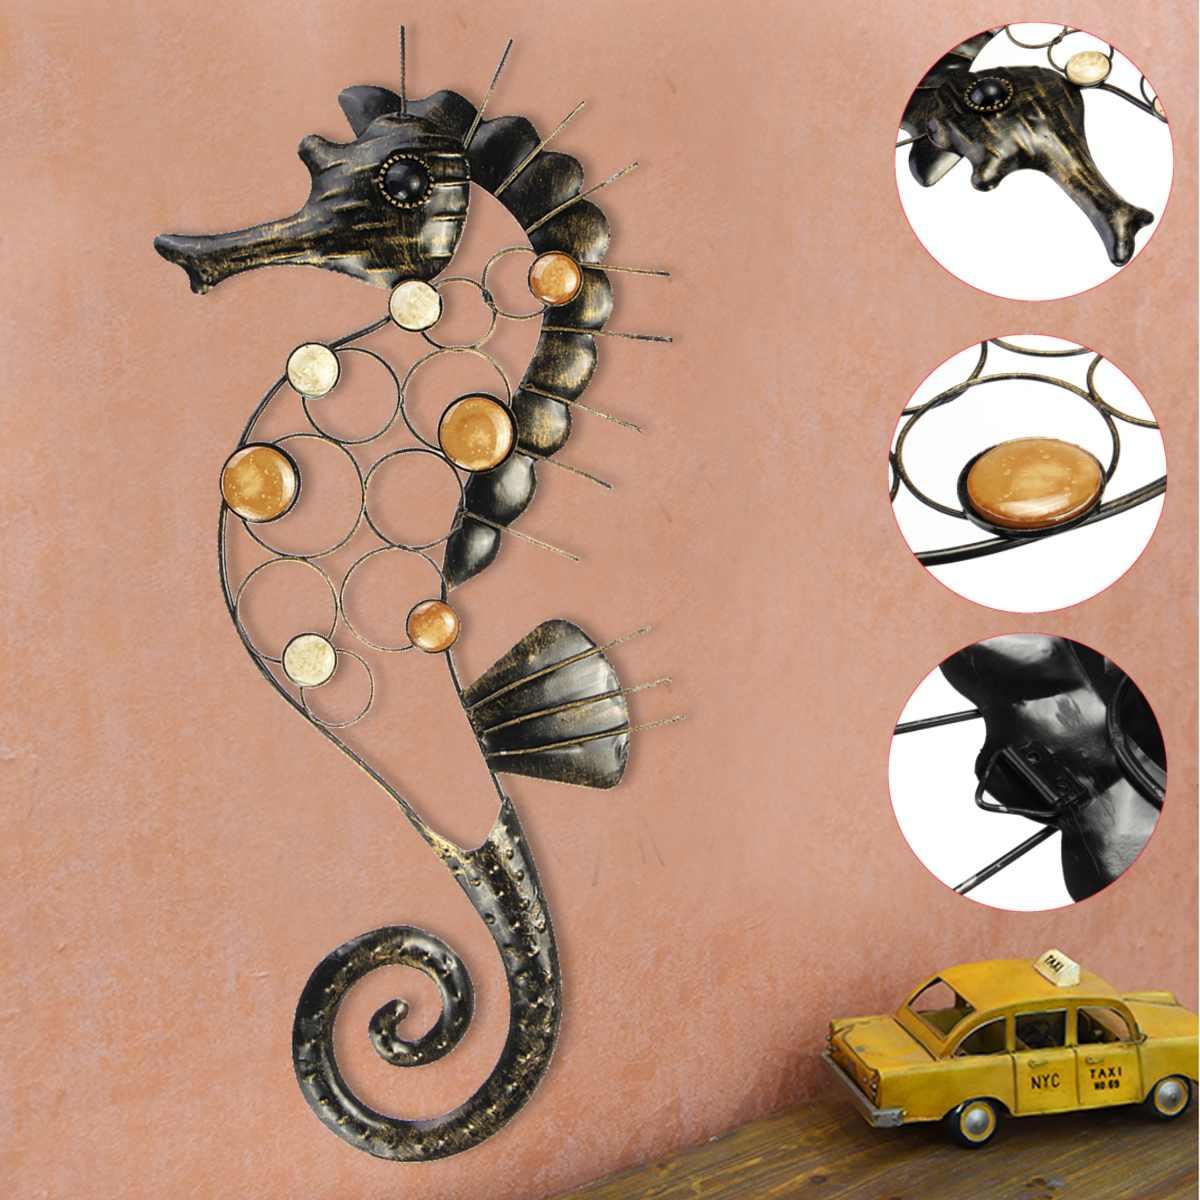 Large Metal Craft Seahorse Hanging Wall Art Garden 3D Decor Outdoor Indoor Home Ornament|Garden Statues & Sculptures| |  - title=